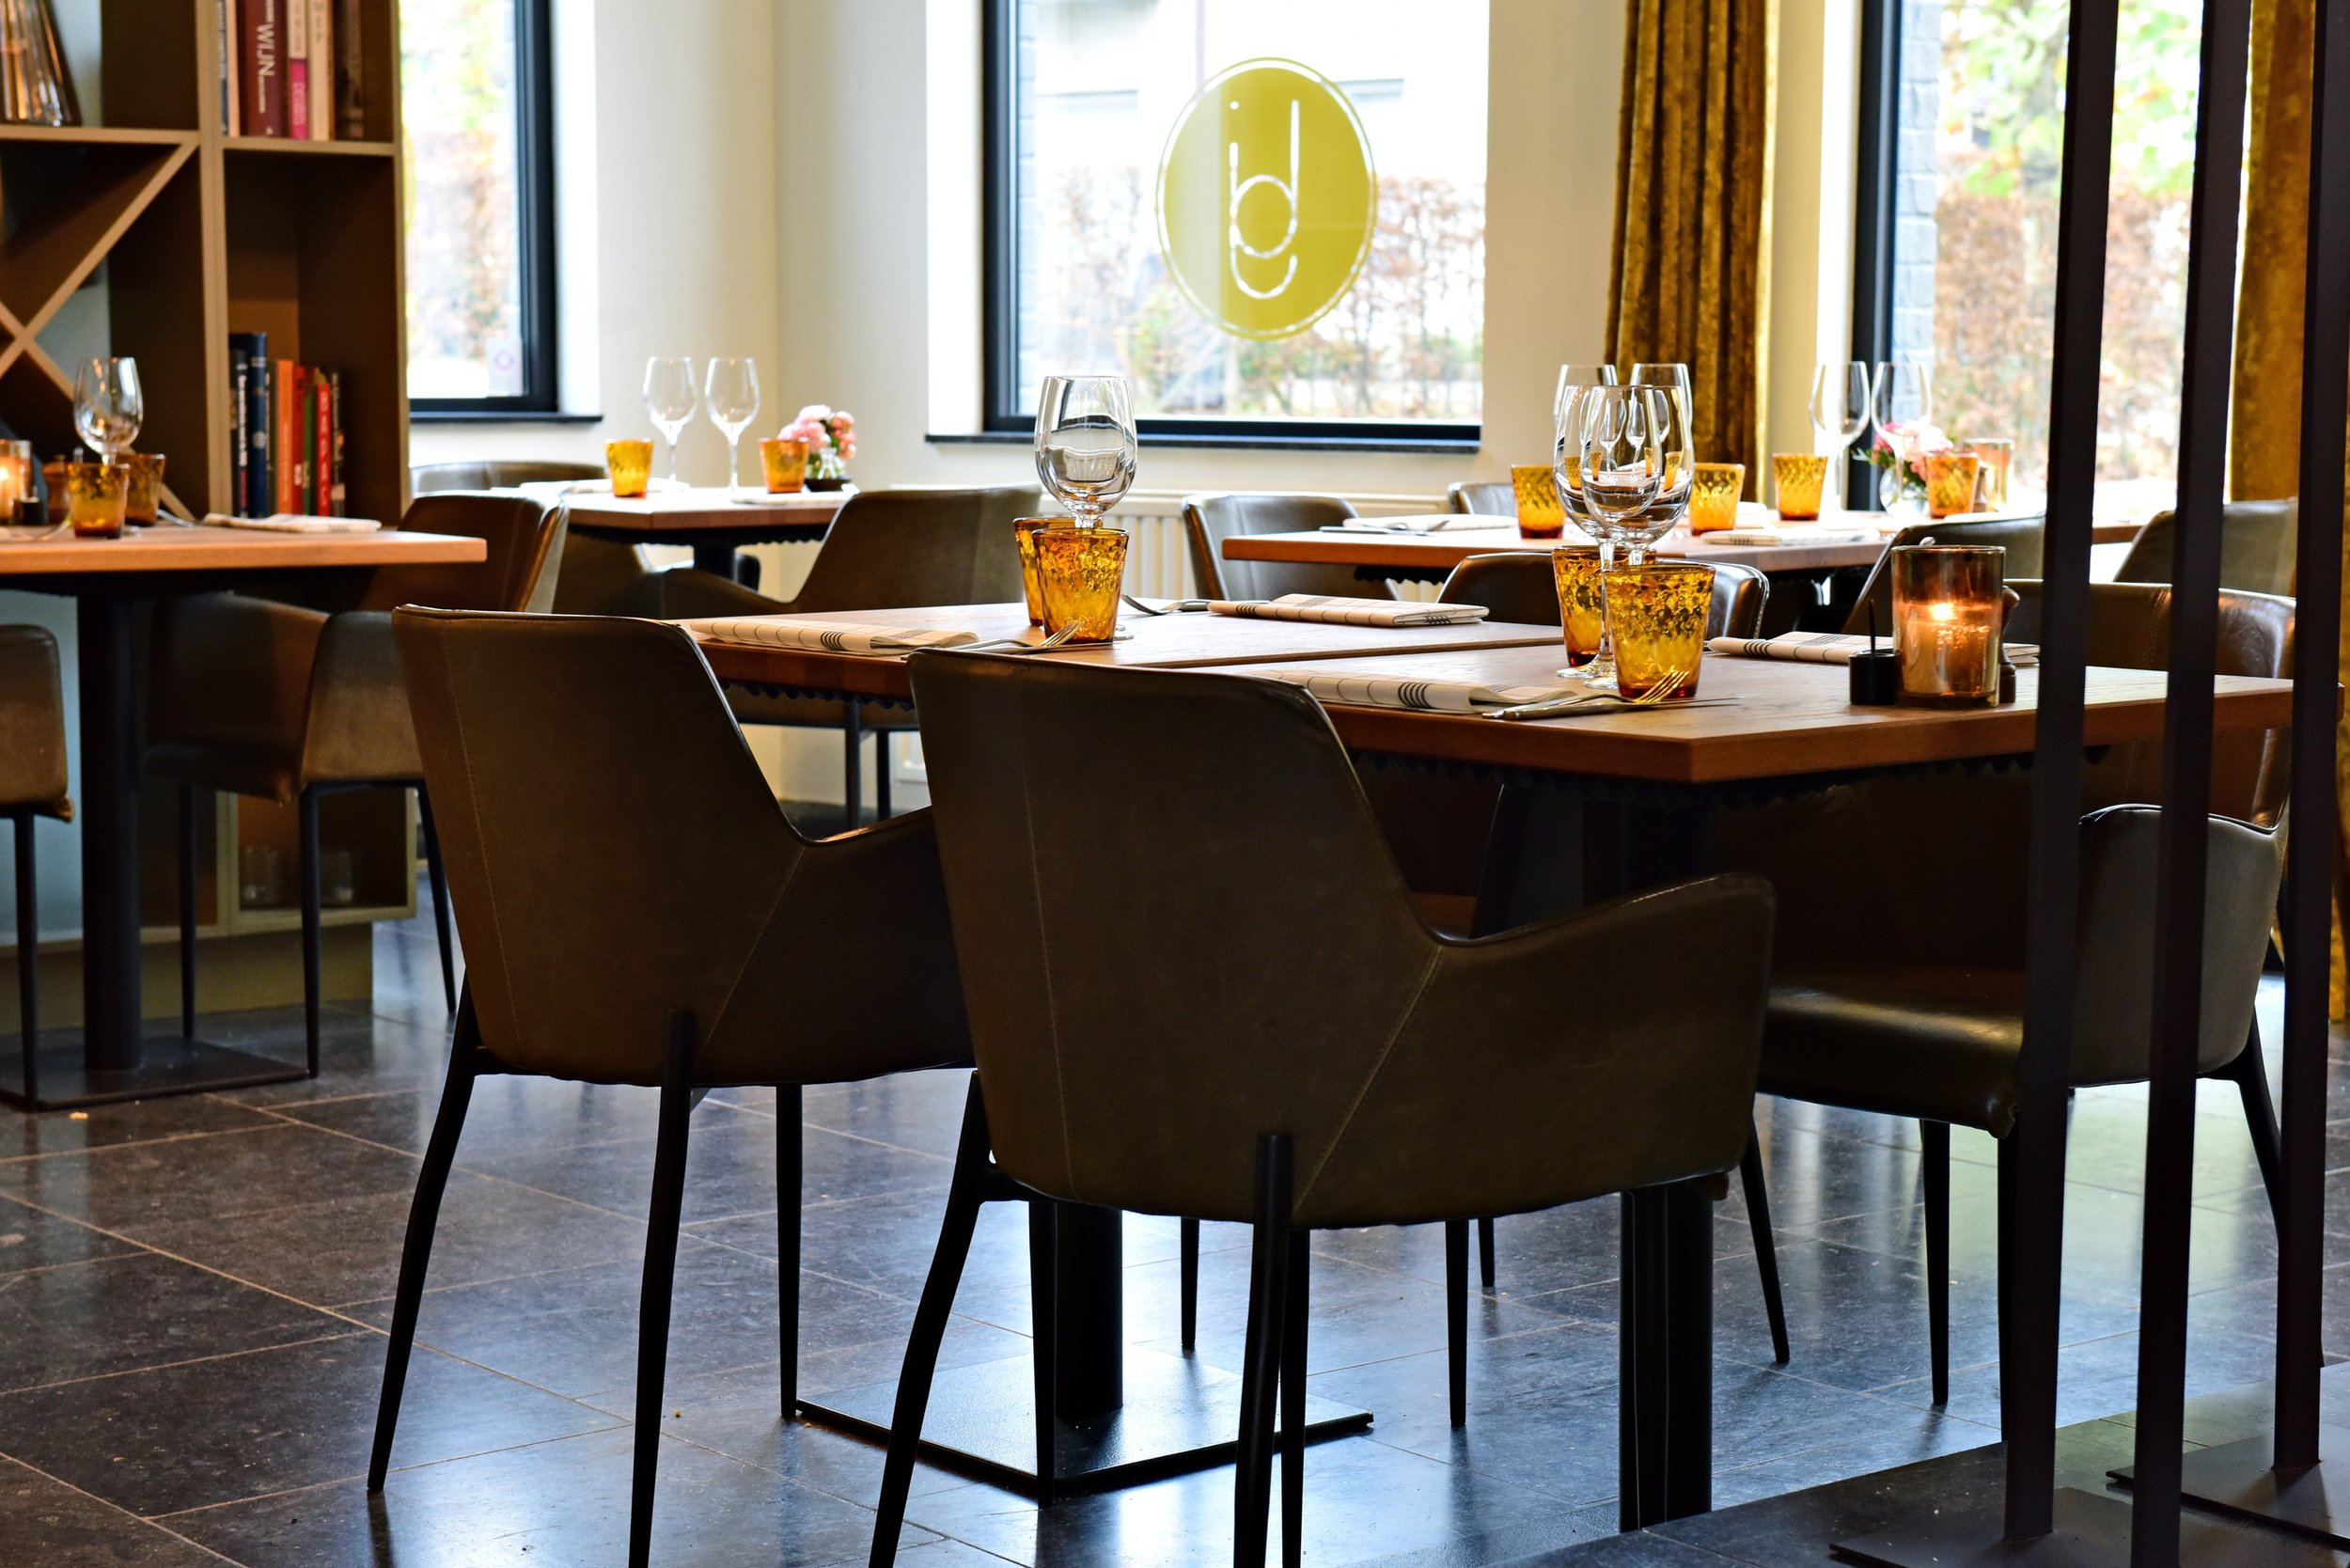 4 brasserie juste restaurant Dikkelvenne tablefever bart albrecht culinair fotograaf foodfotograaf.jpg